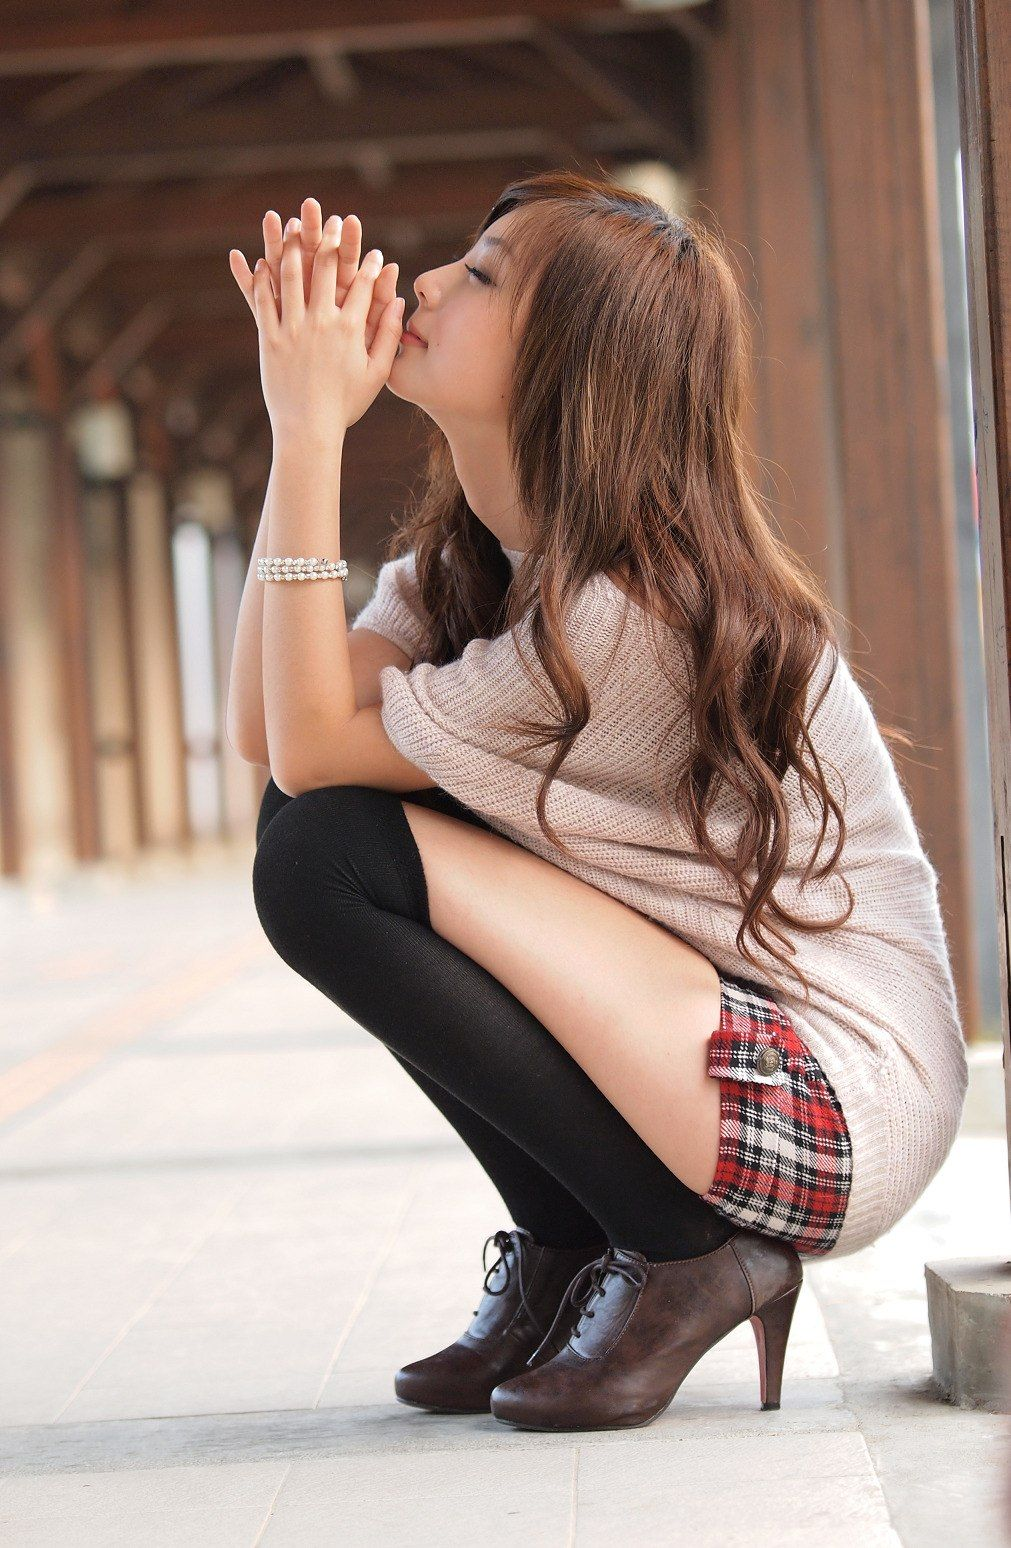 Asian teens in socks